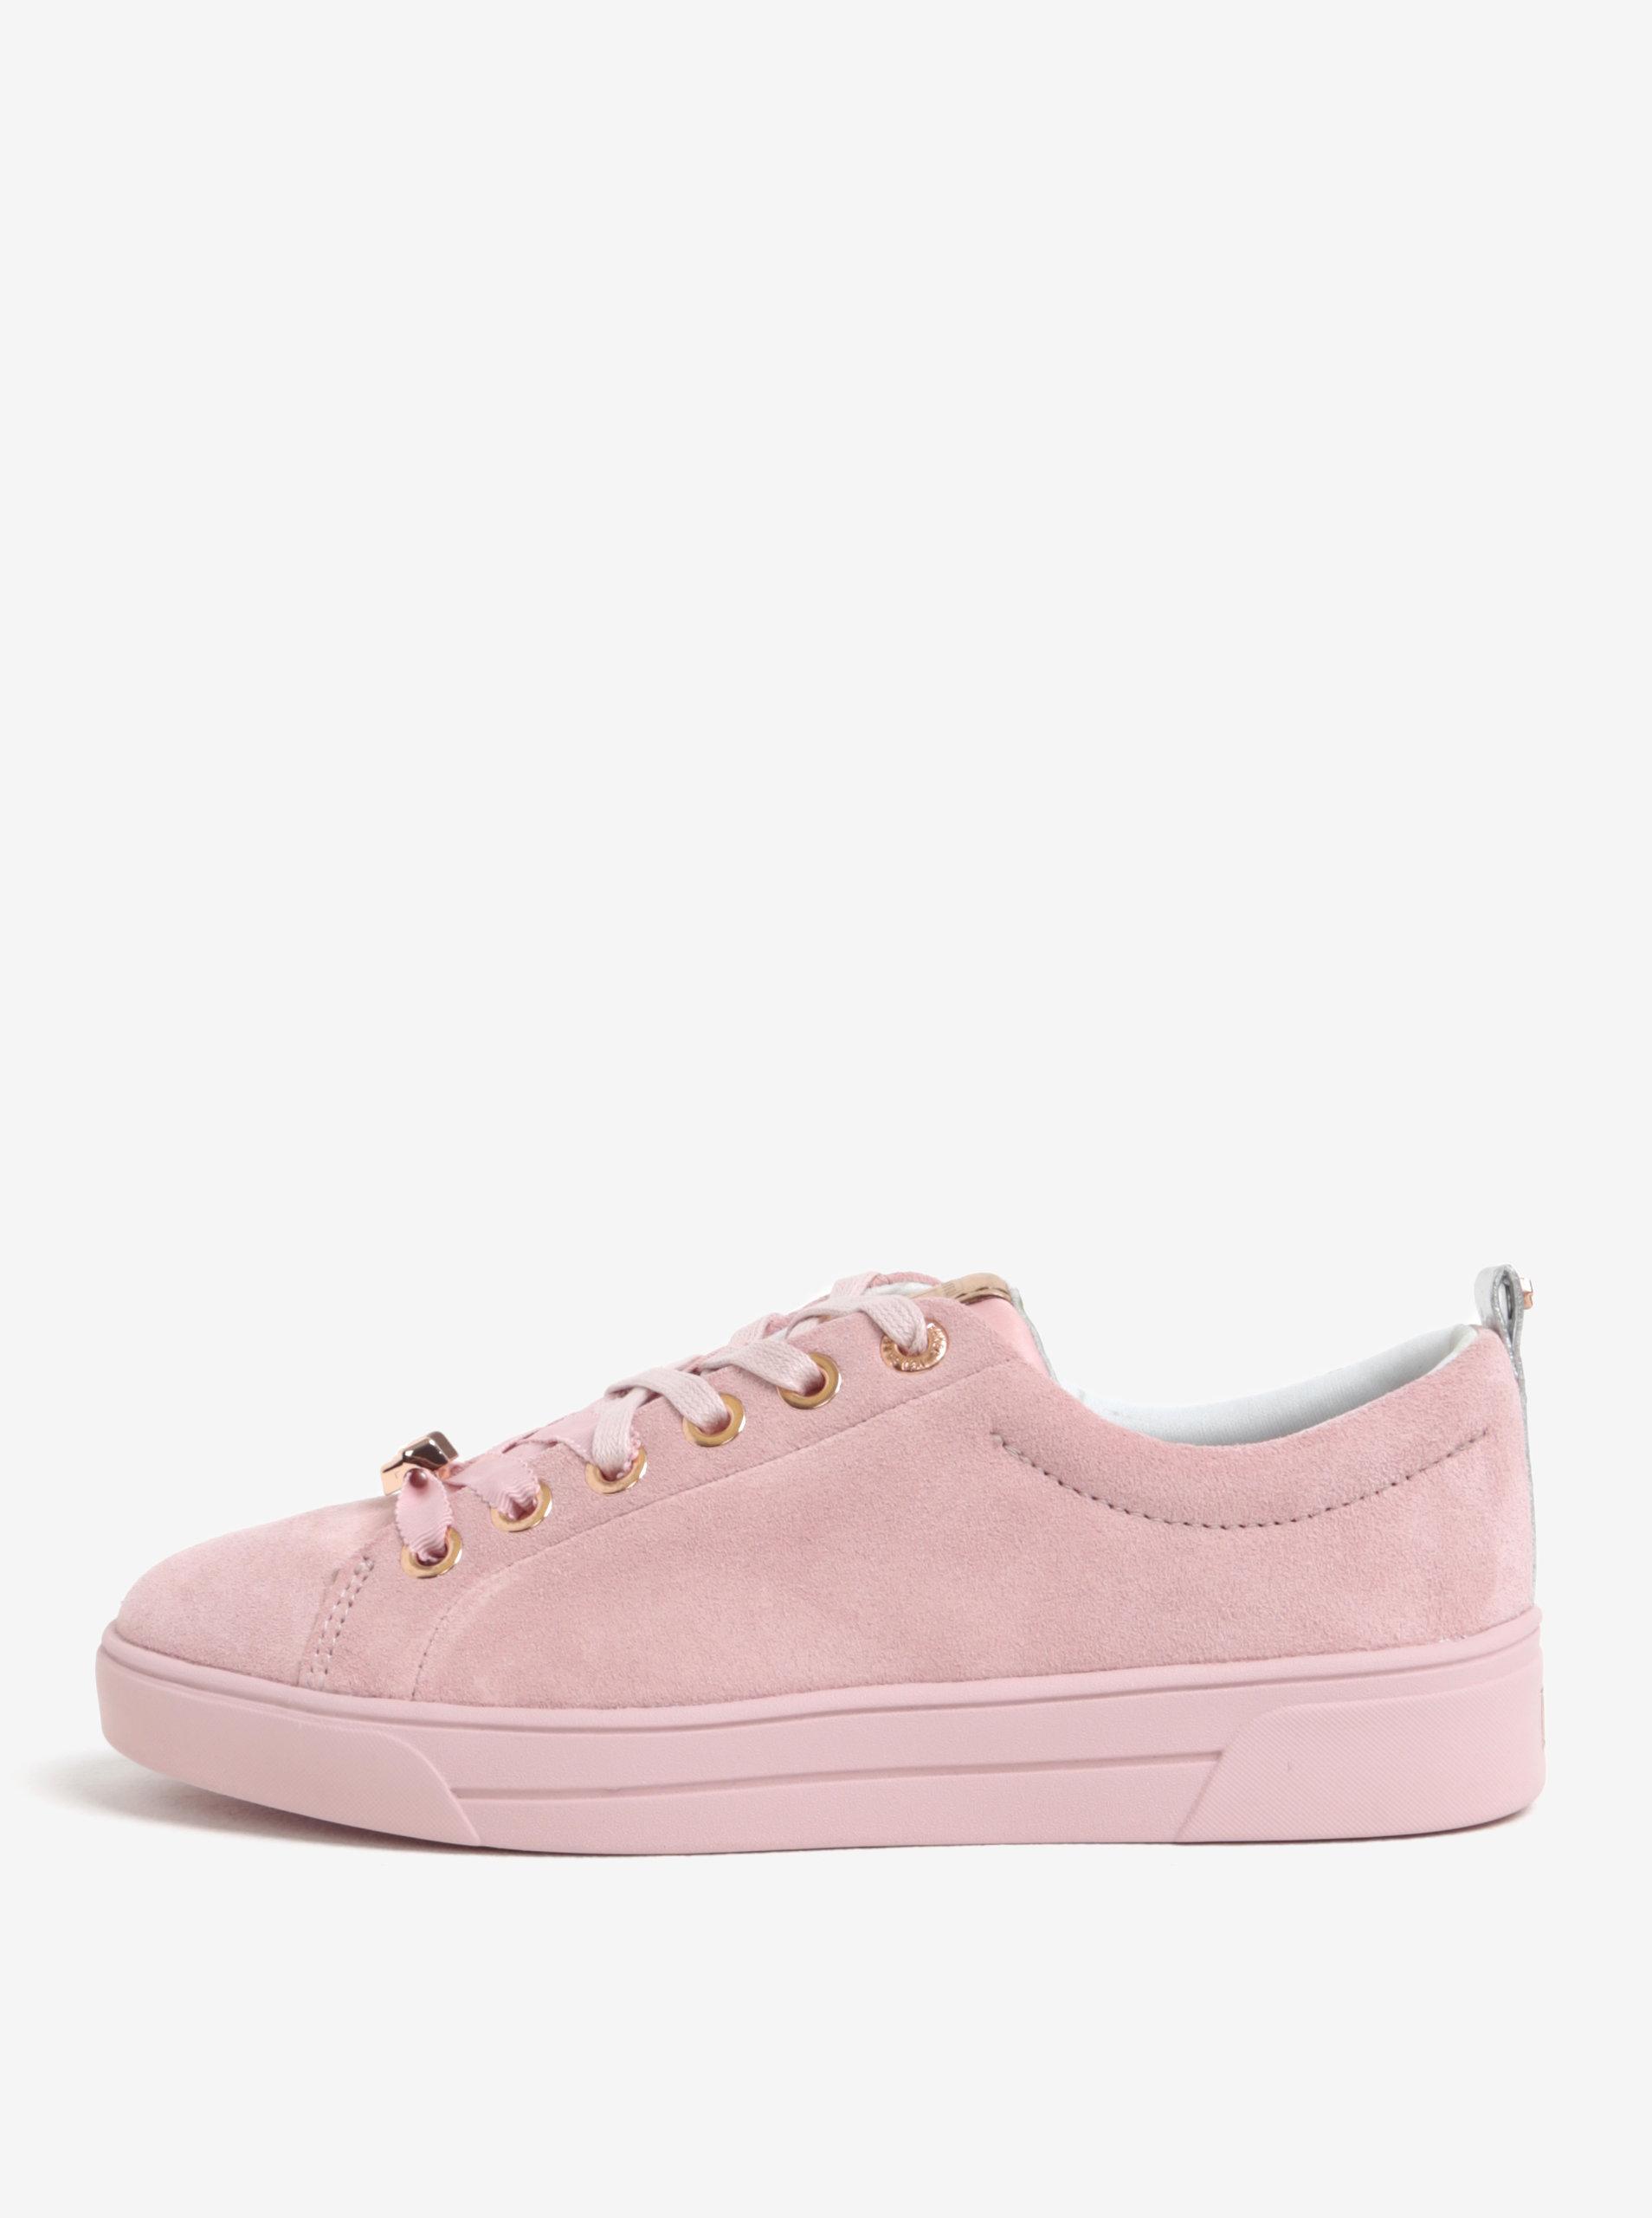 Ružové semišové tenisky Ted Baker Kellei S ... a20ff41ae1e